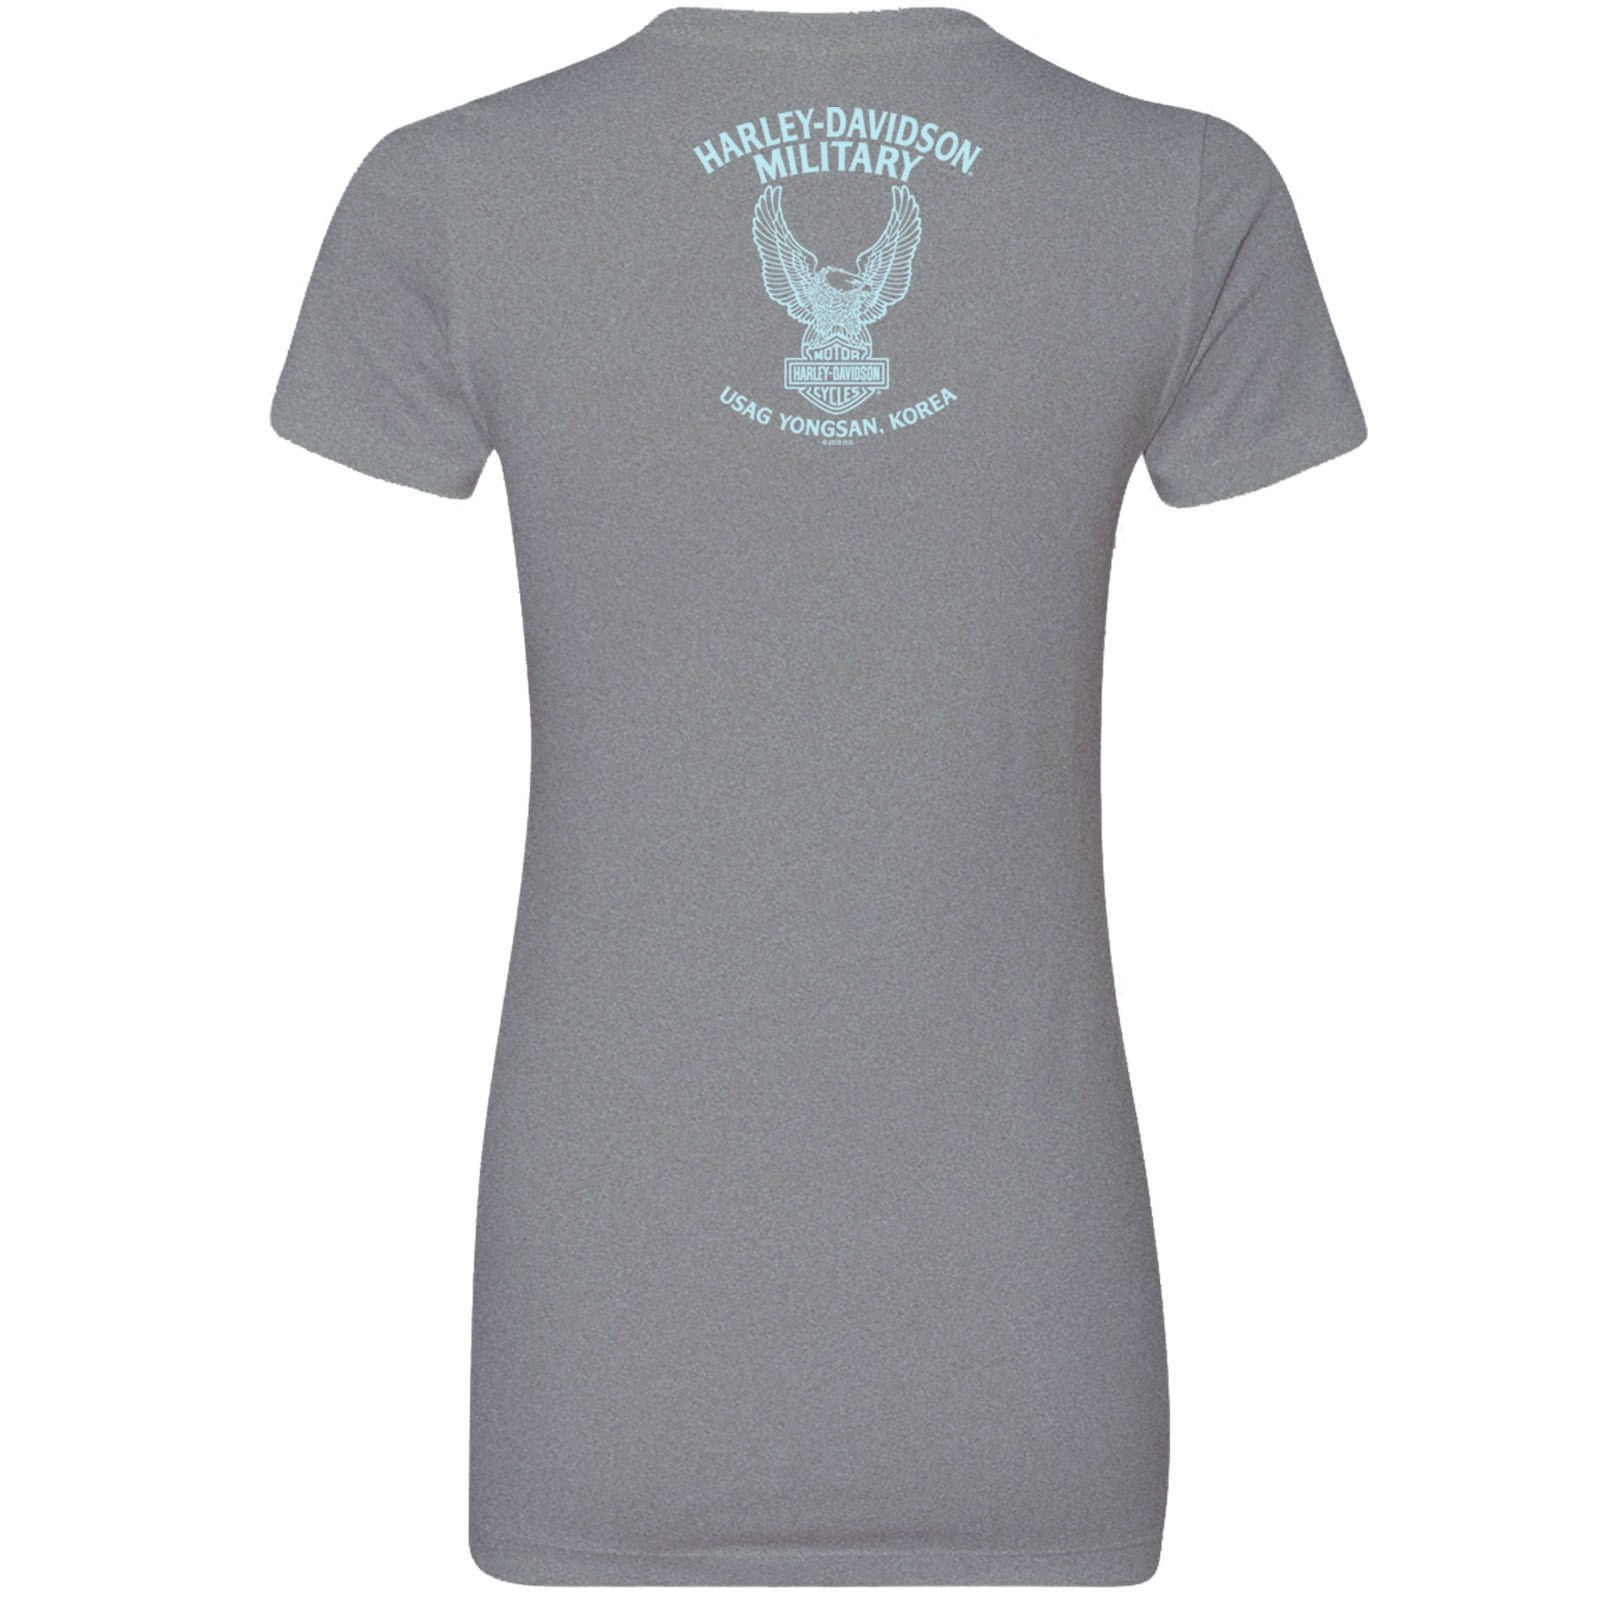 Fit slim shirts for davidson women t harley black professional